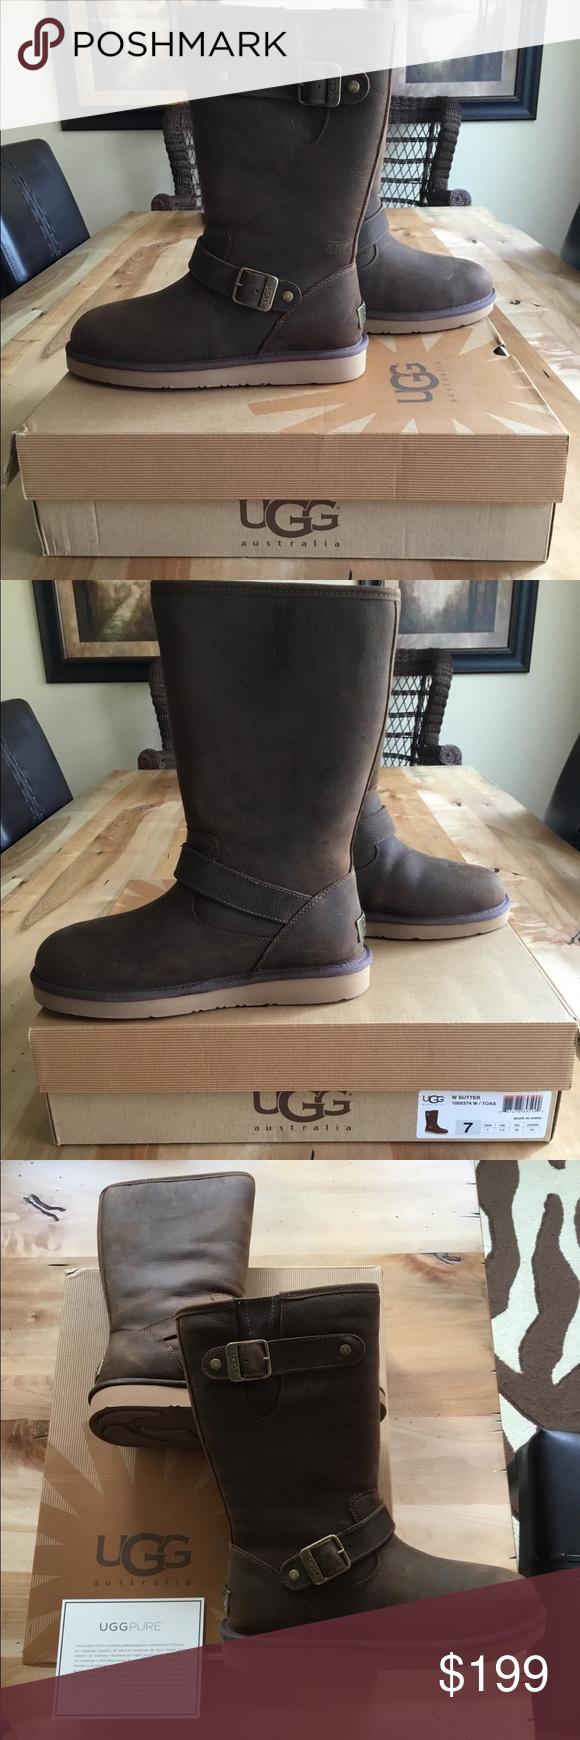 46e8ecffd25 NWT UGG Sutter Boots NWT | My Posh Picks | Pinterest | Ugg shoes ...